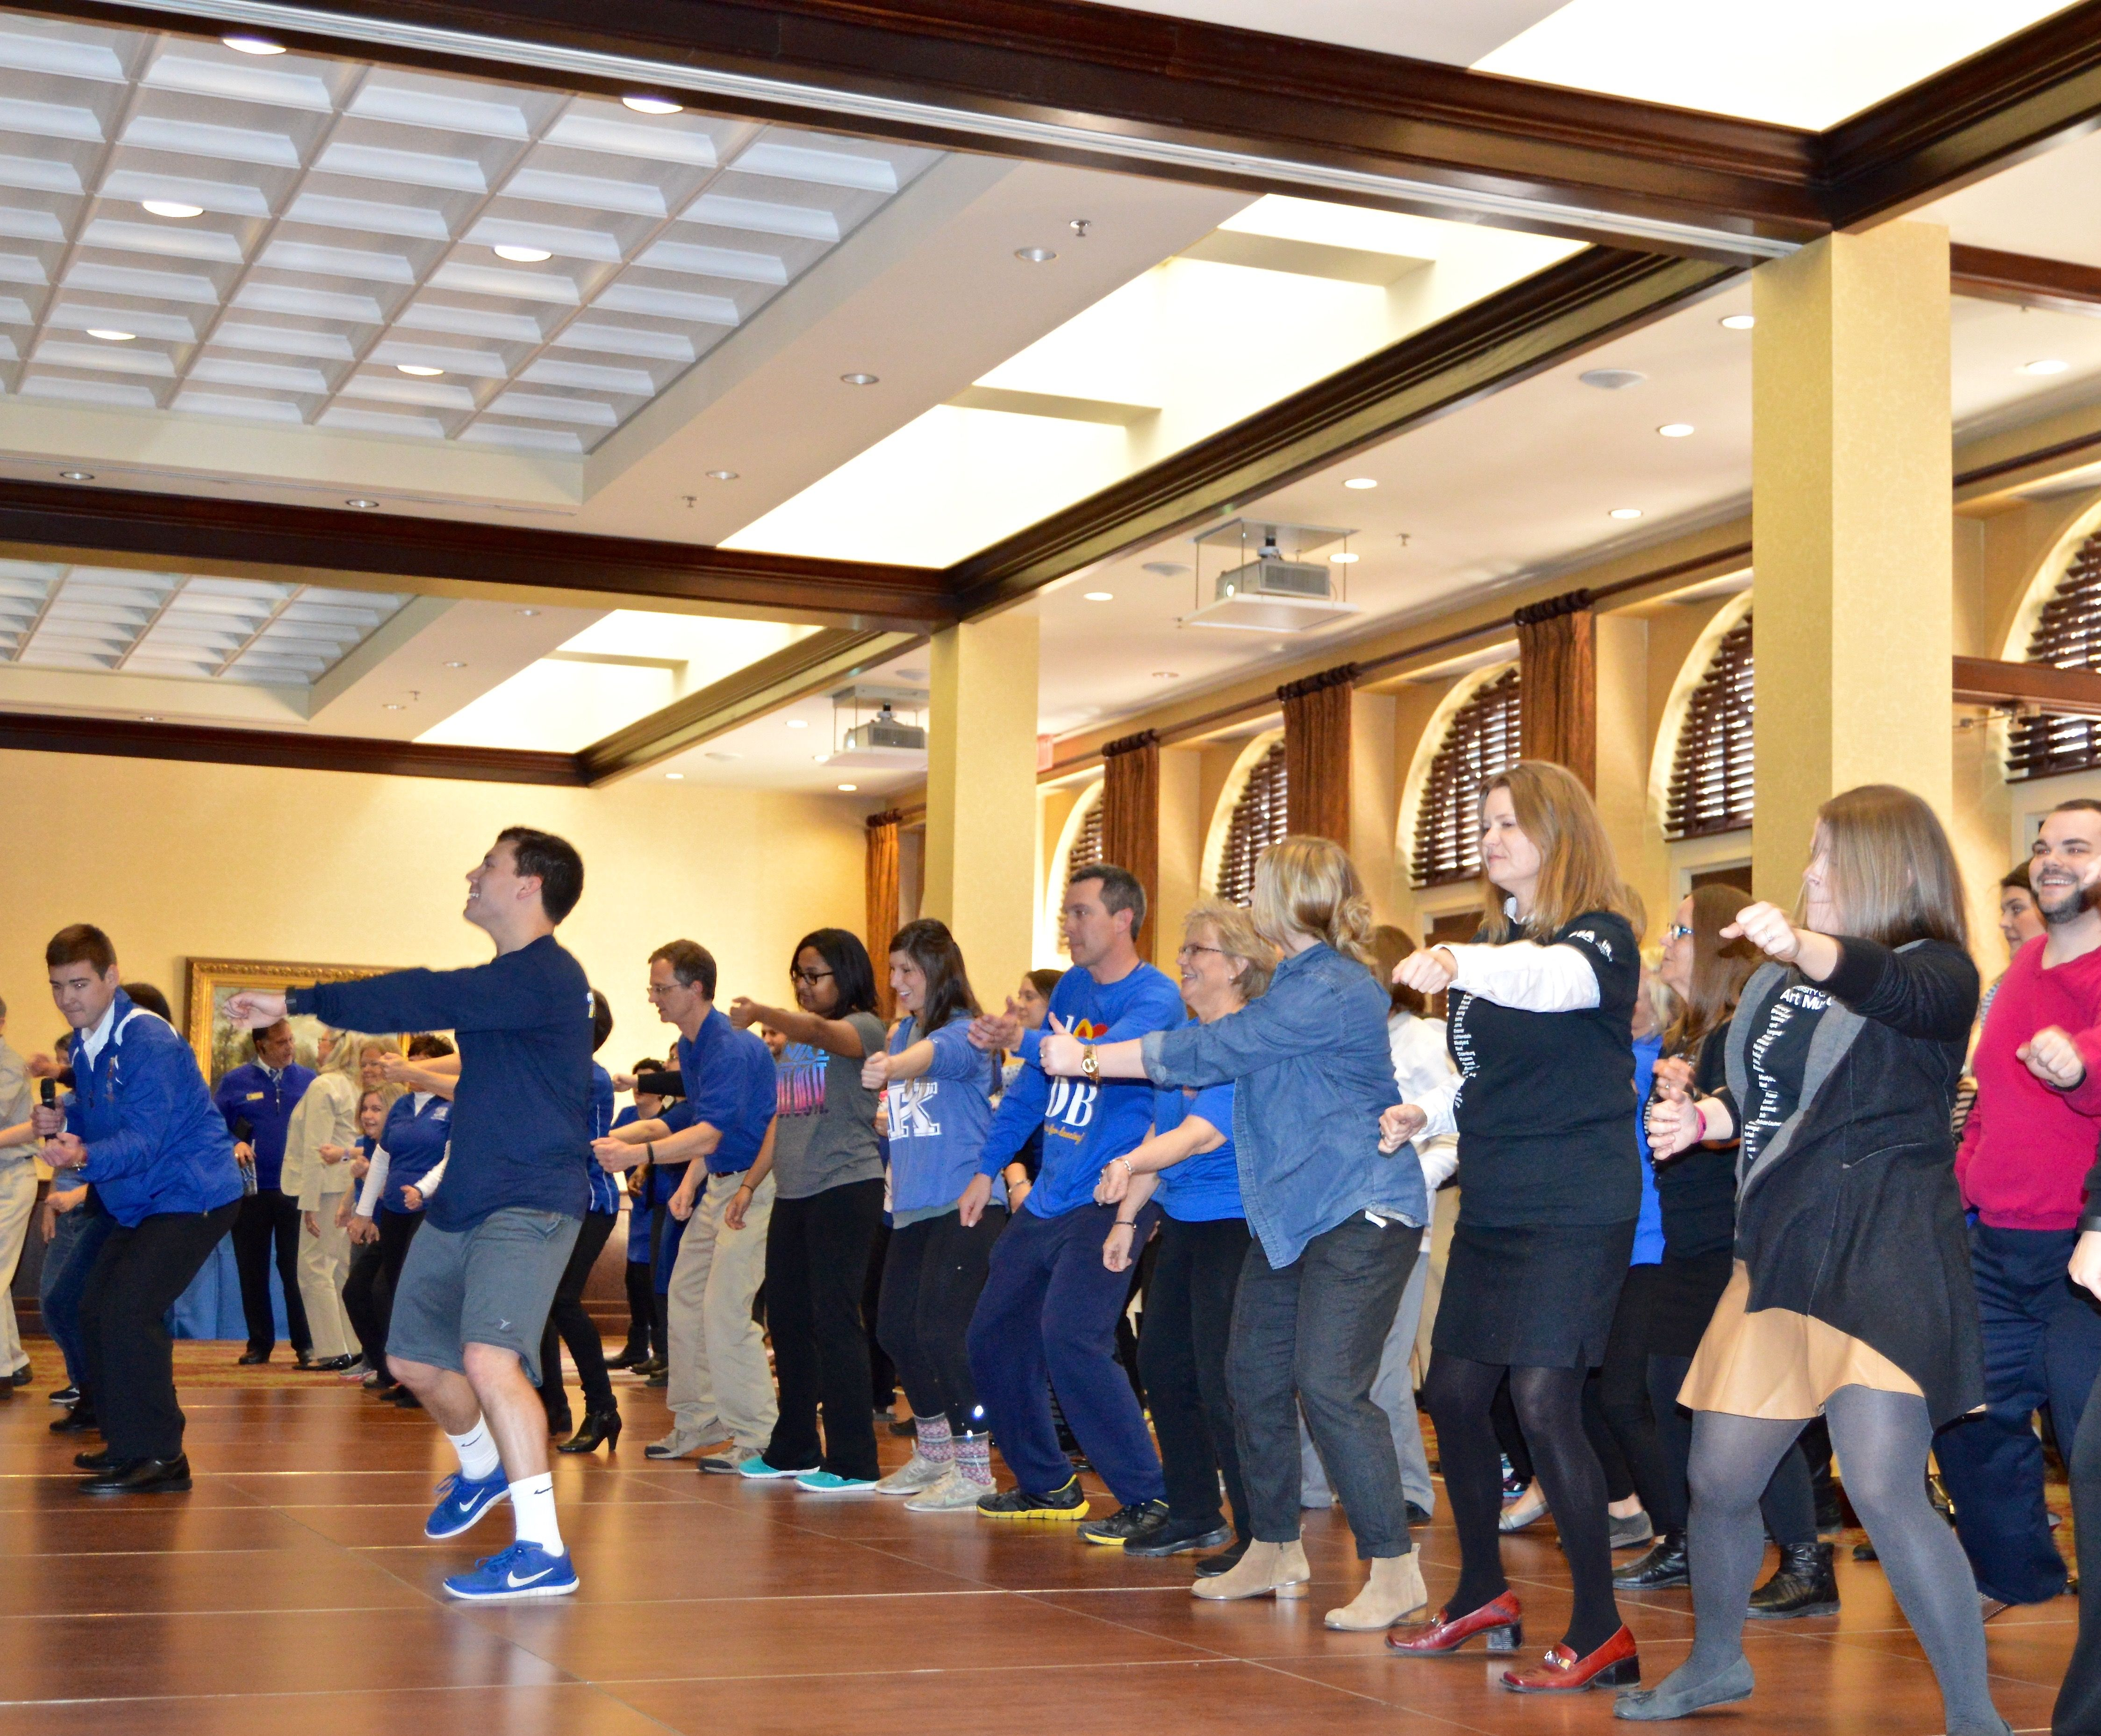 1st UK DanceBlue Faculty/Staff Mini Marathon